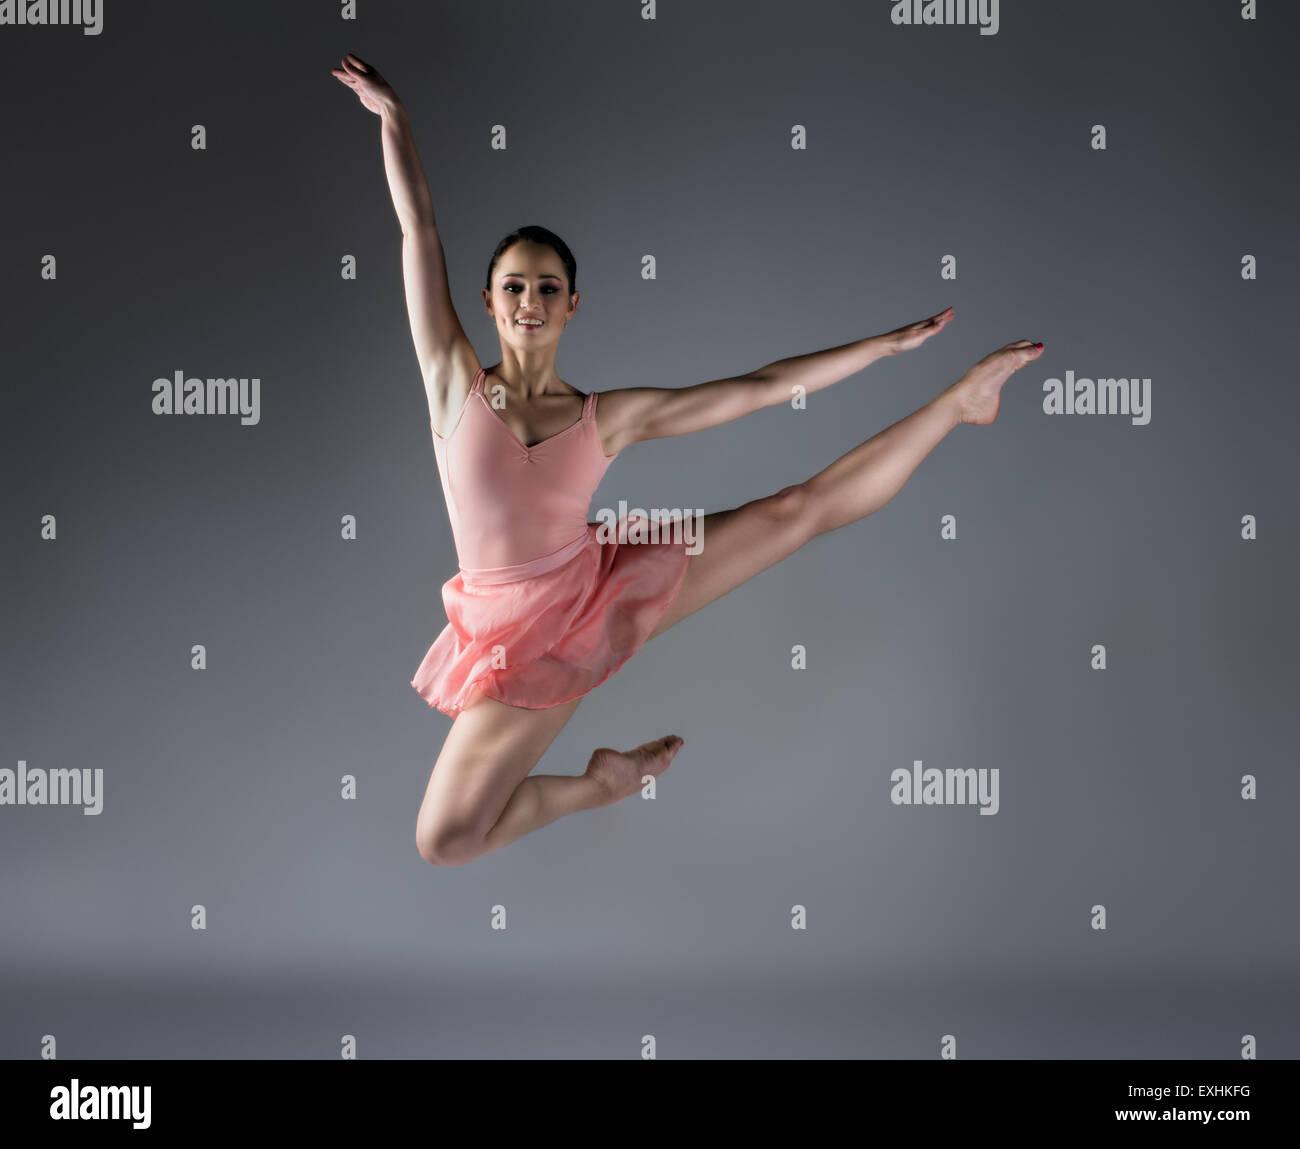 Mujer hermosa bailarina de ballet sobre un fondo gris